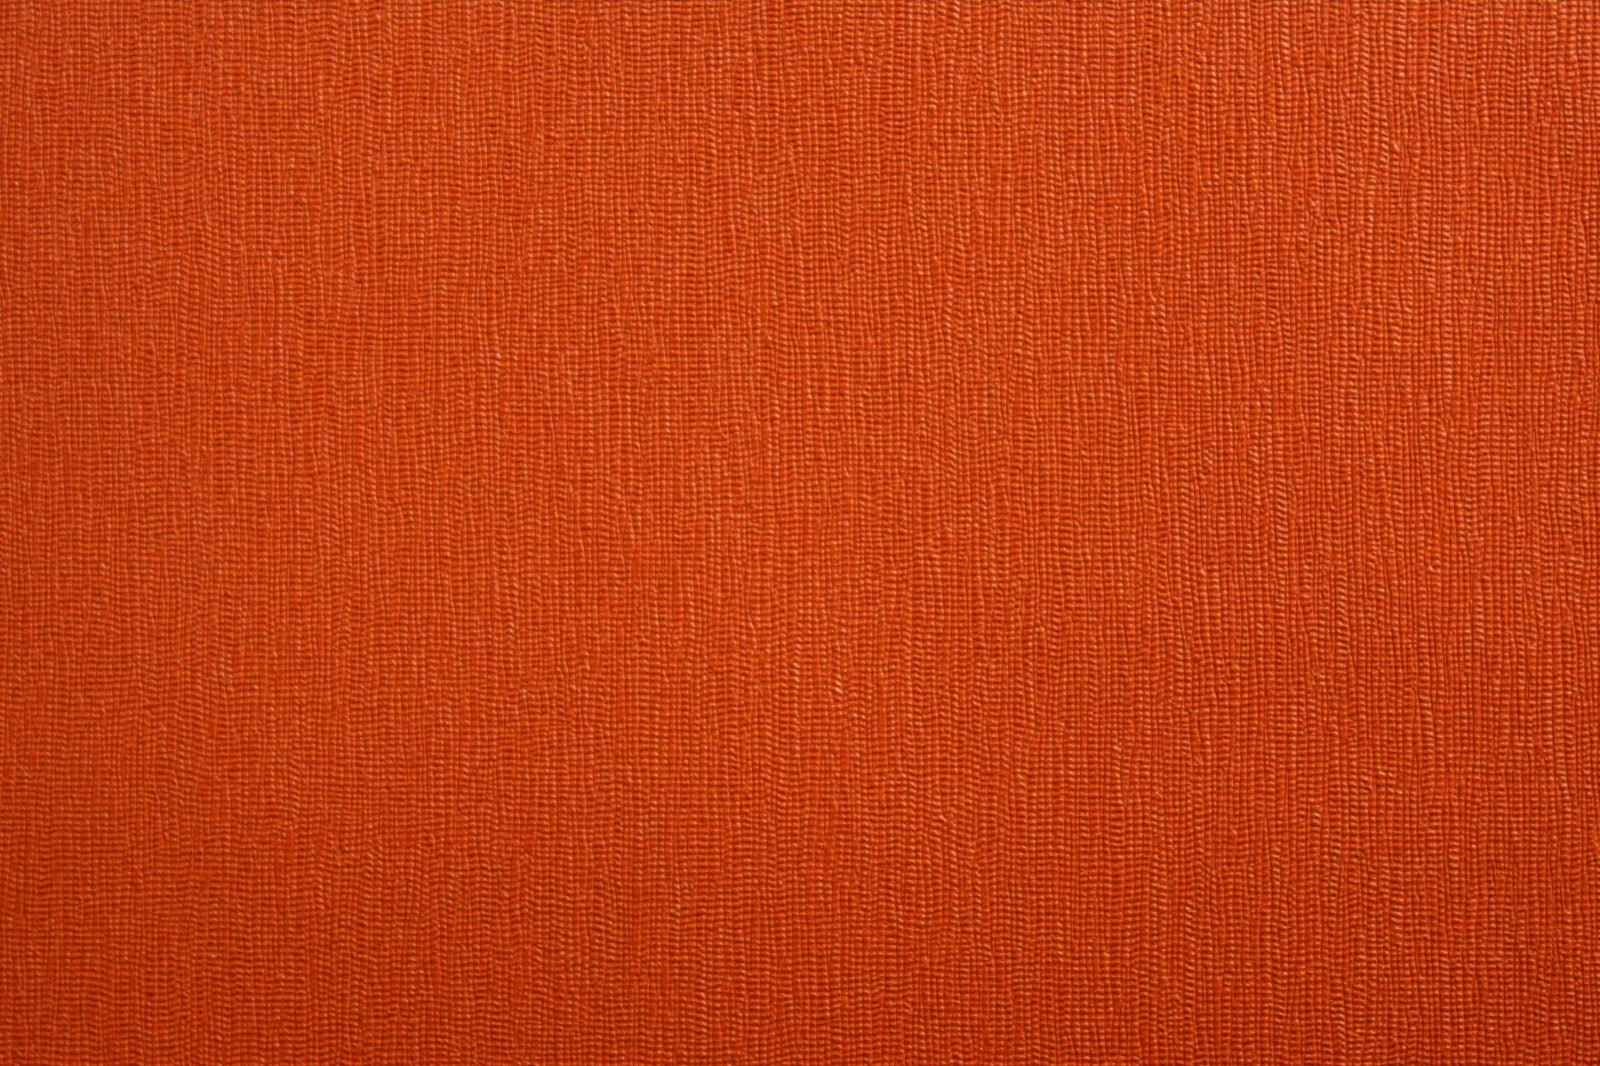 Tapete rasch seduction 796230 uni rot orange for Tapete orange